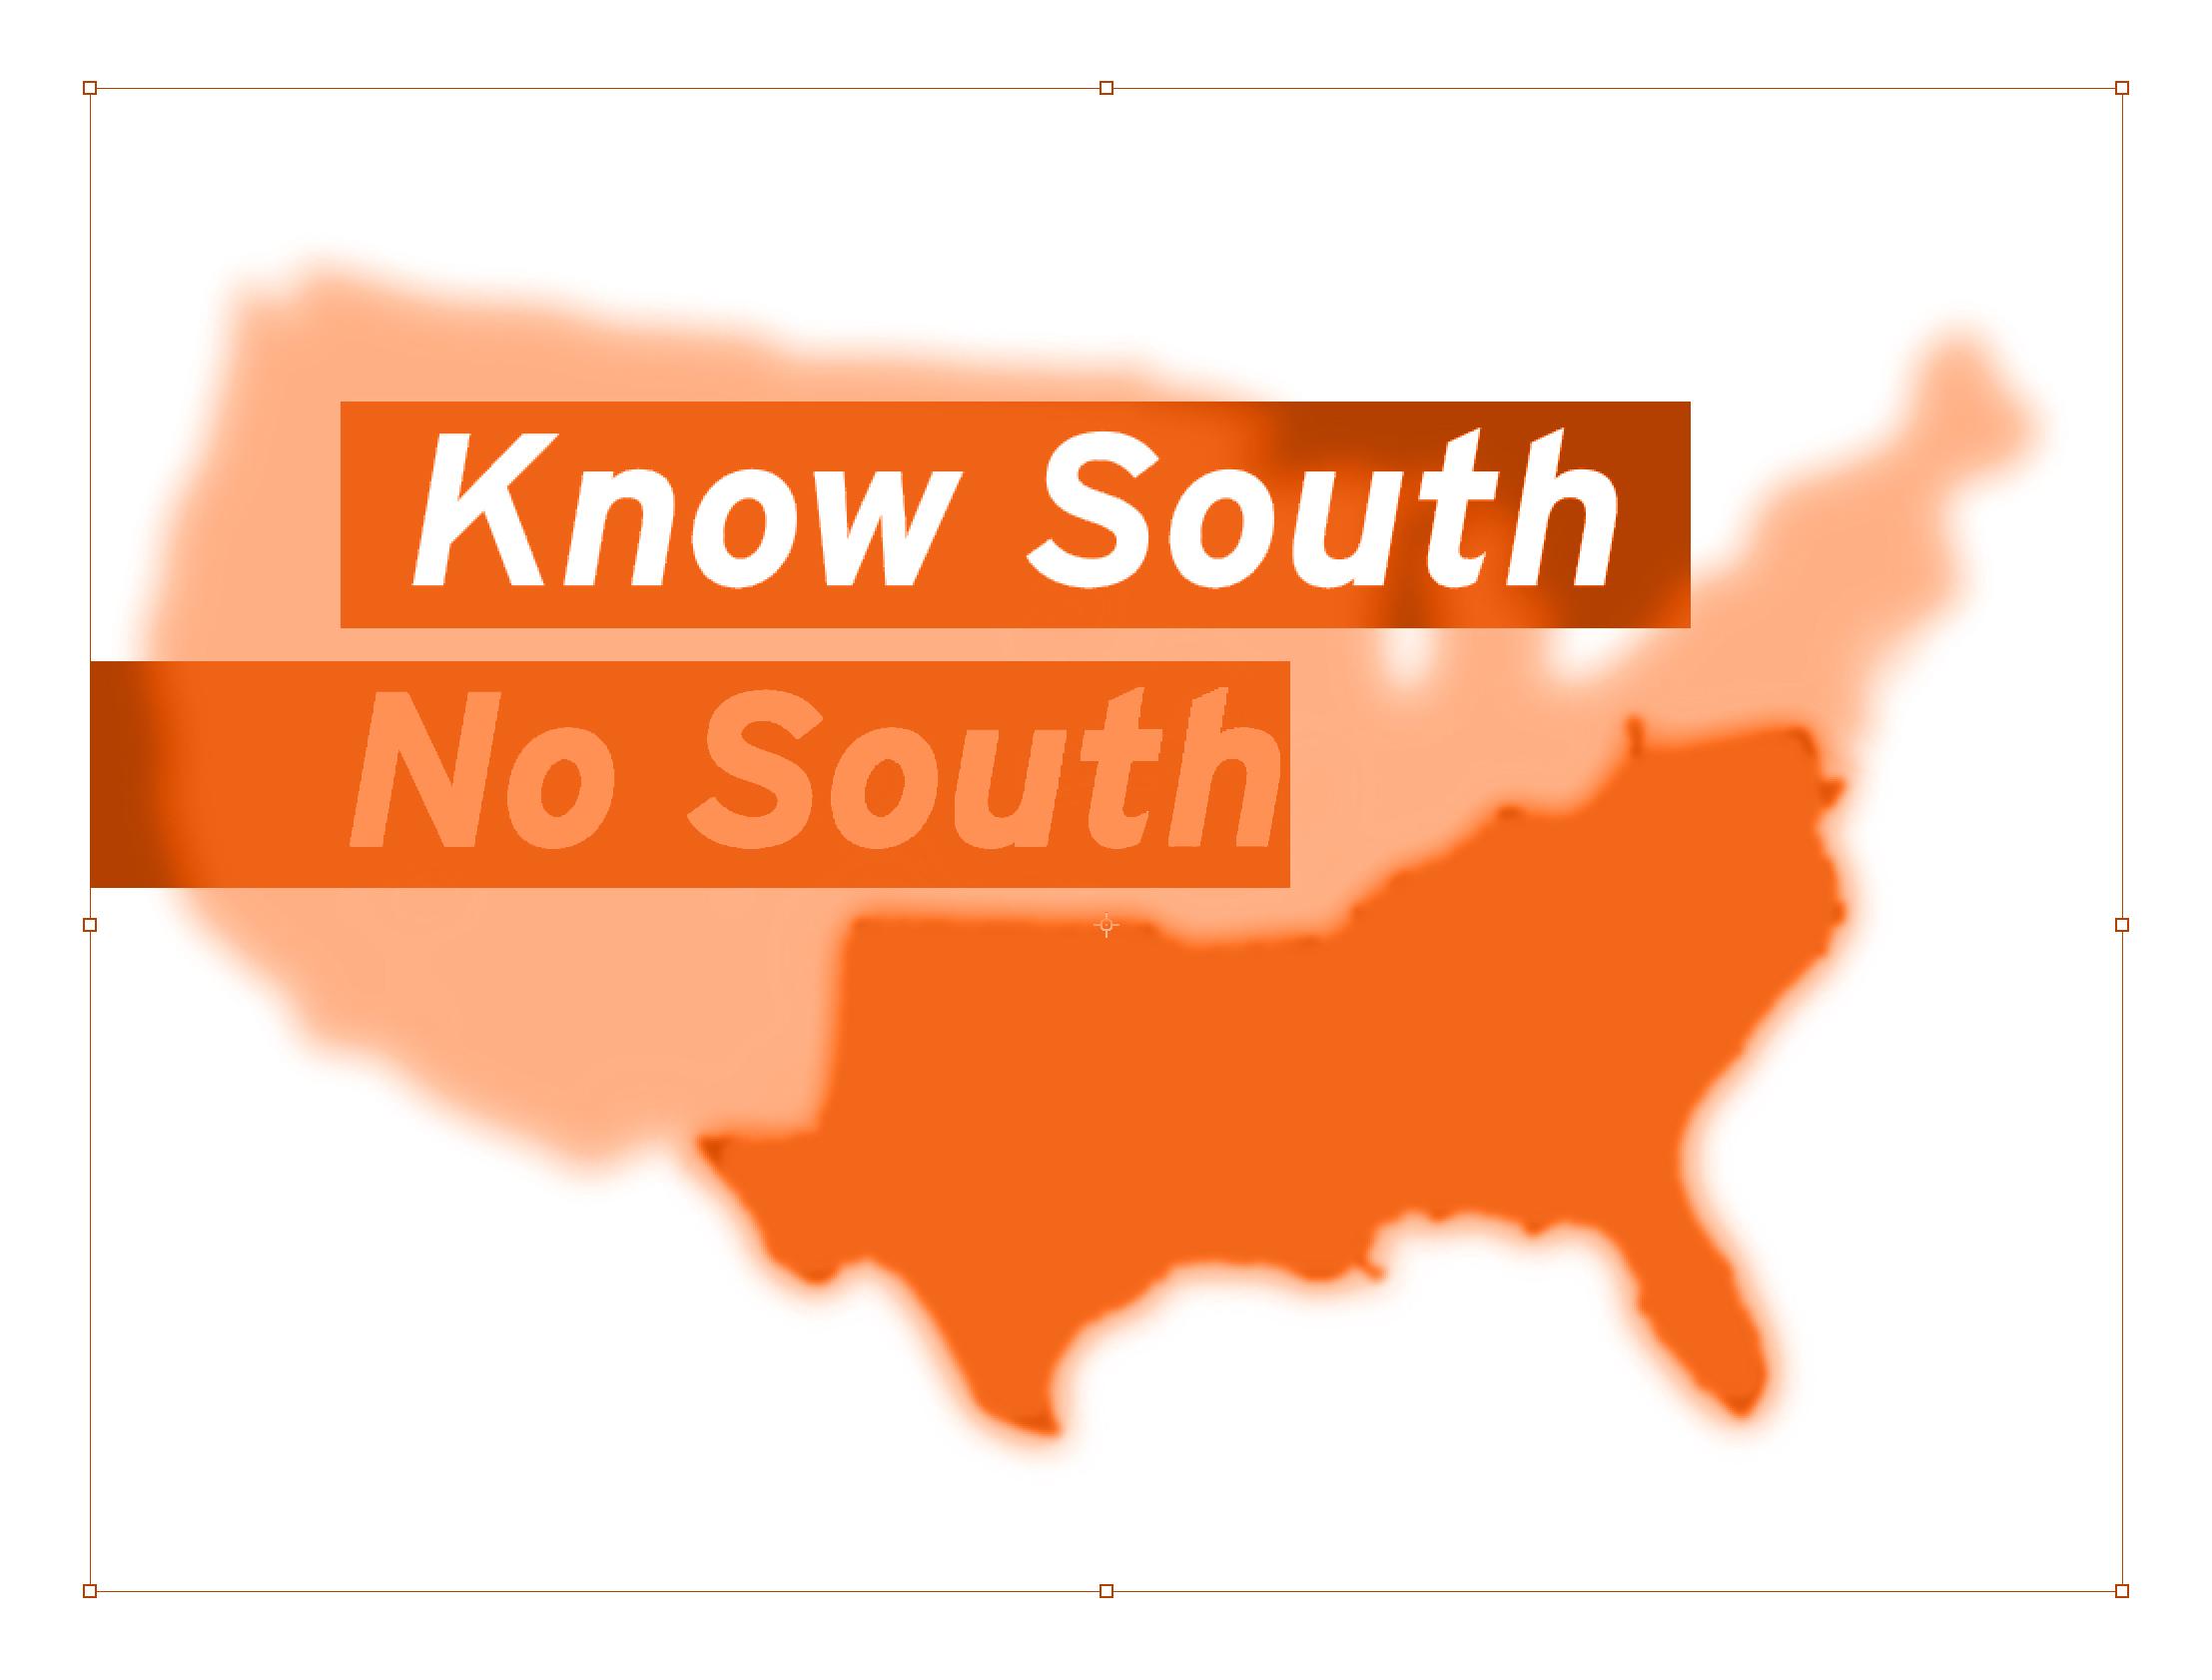 The-American-South-Map-21.jpg